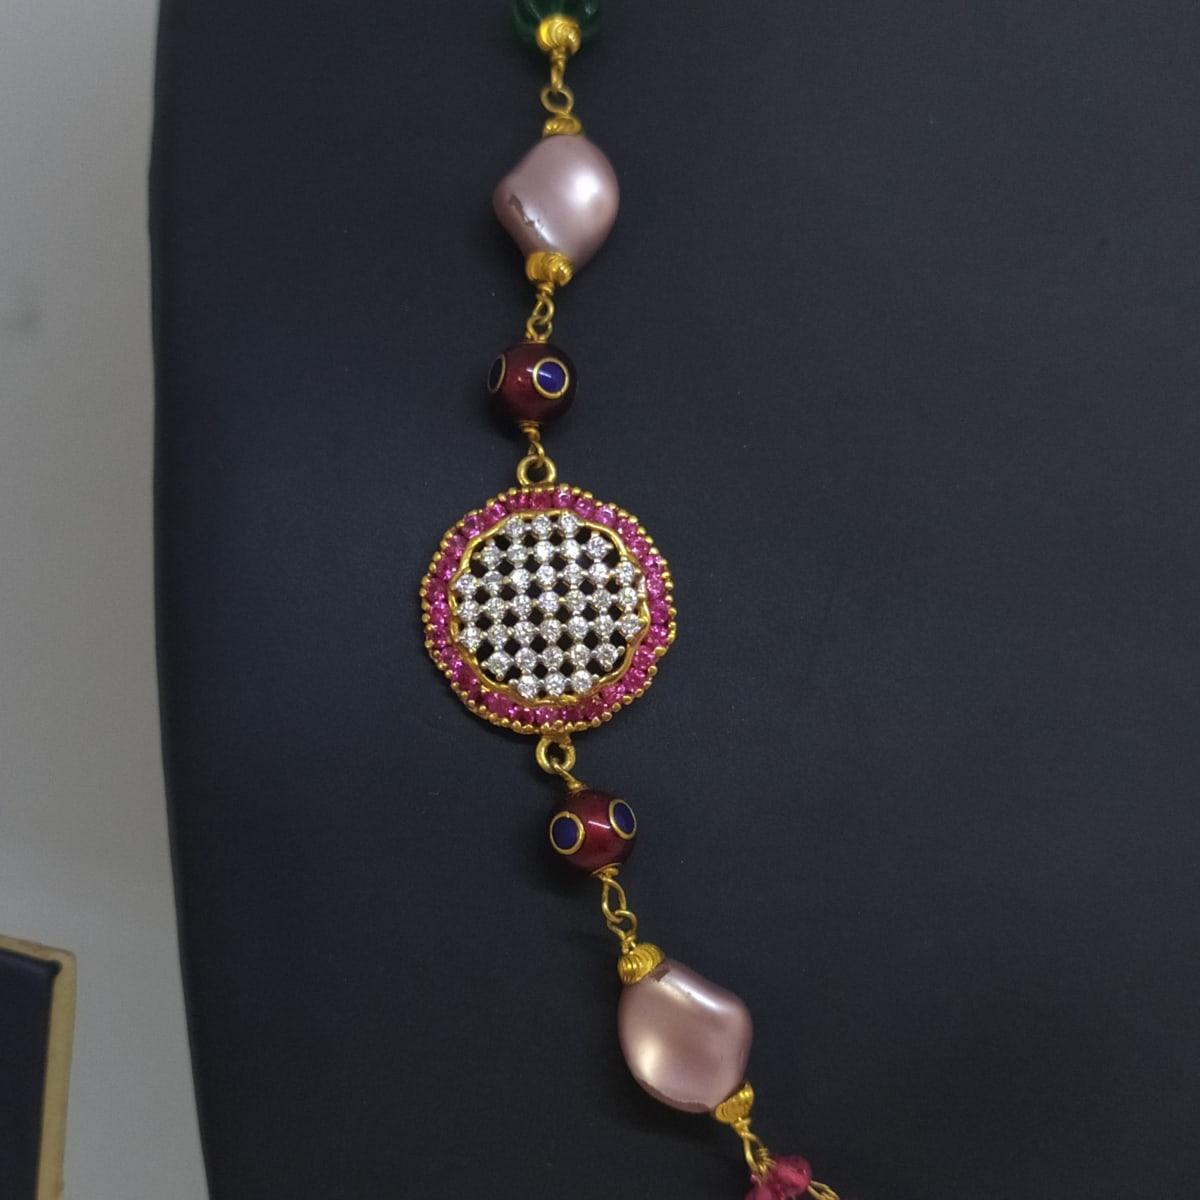 Tricolor Stone And Cz Chain